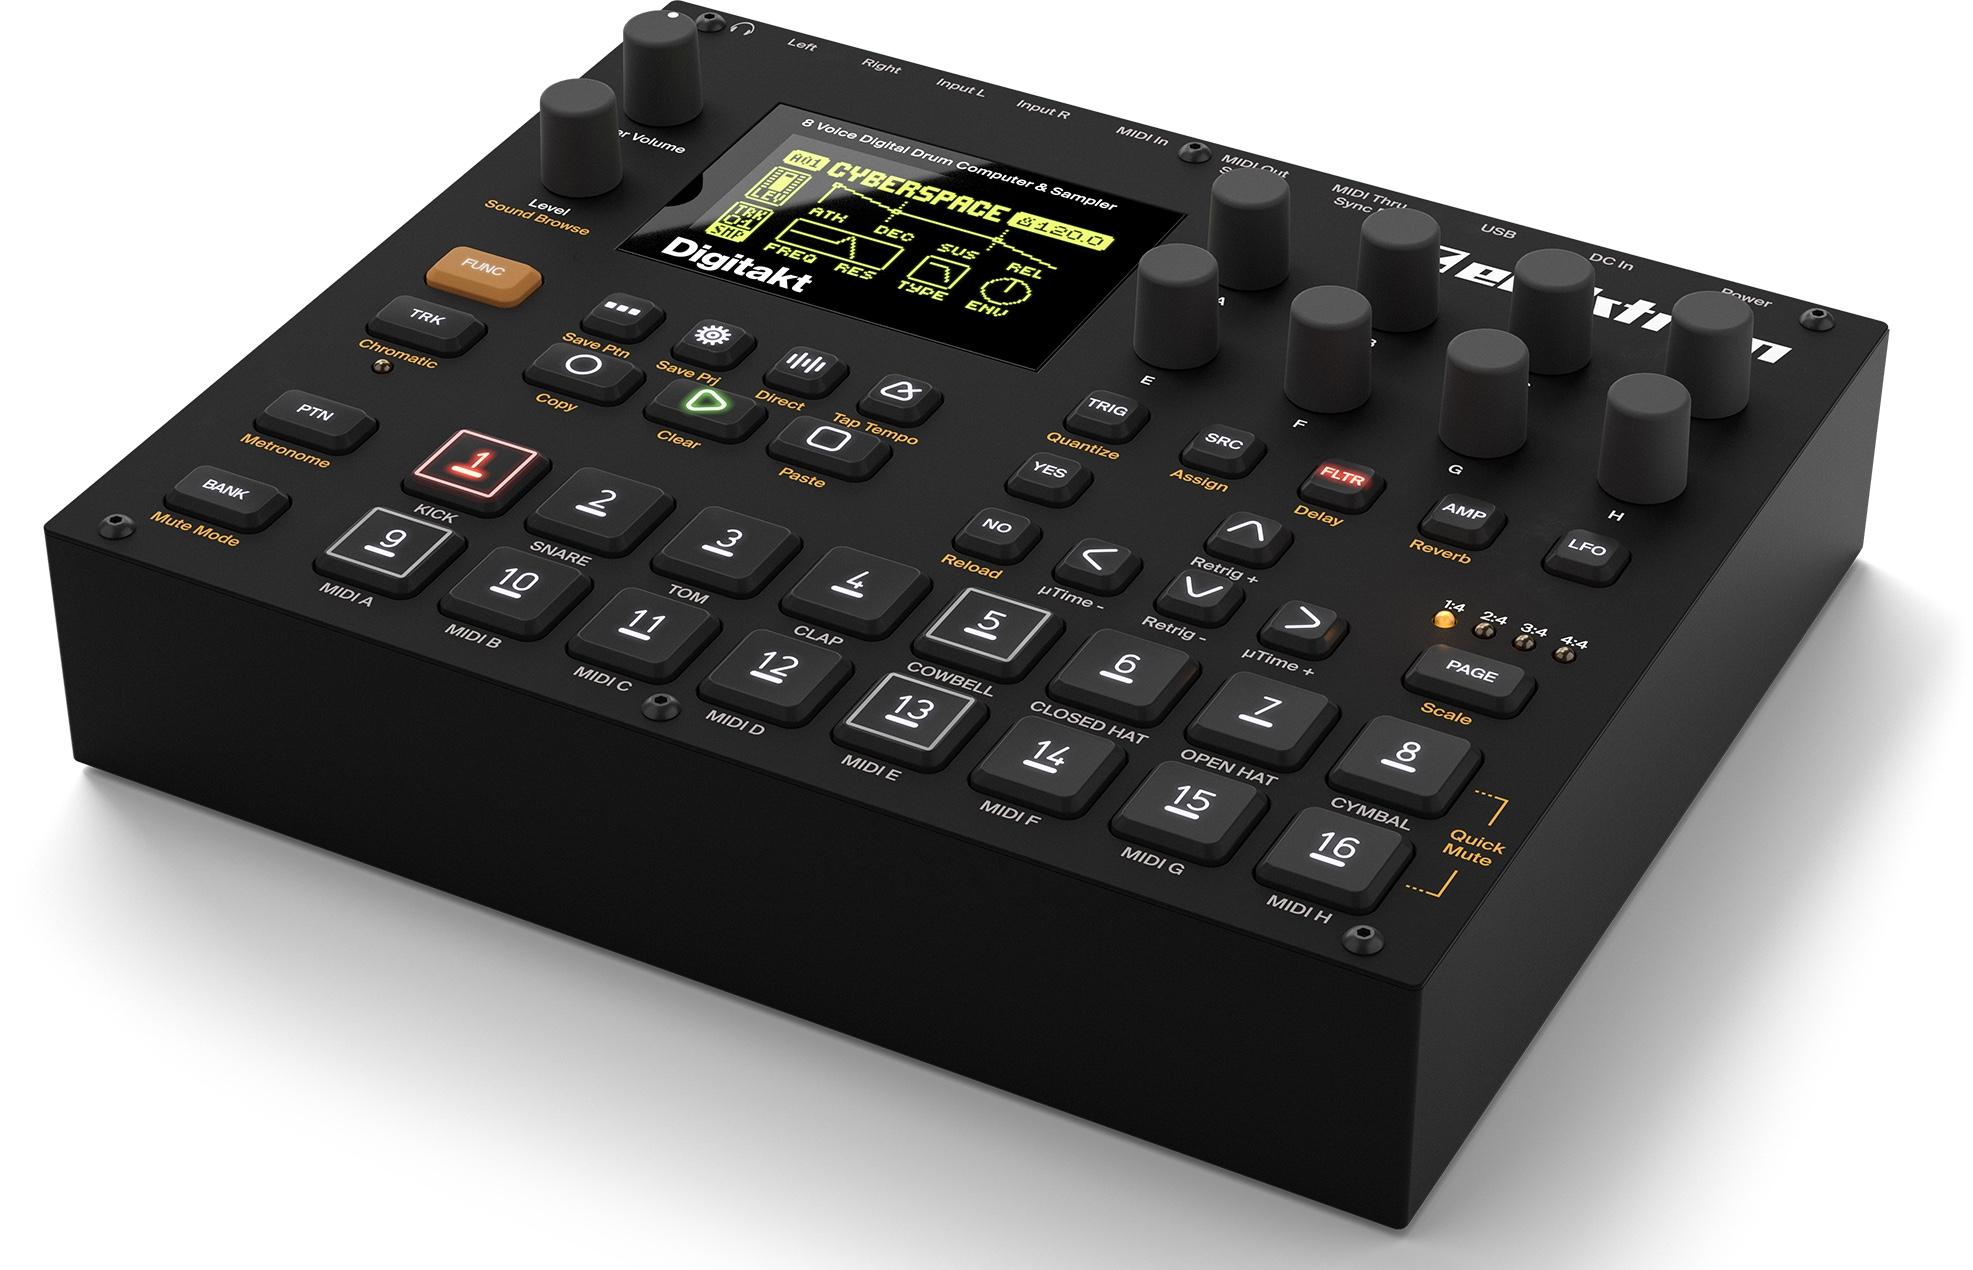 elektron 39 s digitakt is a compact drum machine sequencer sampler cdm create digital music. Black Bedroom Furniture Sets. Home Design Ideas